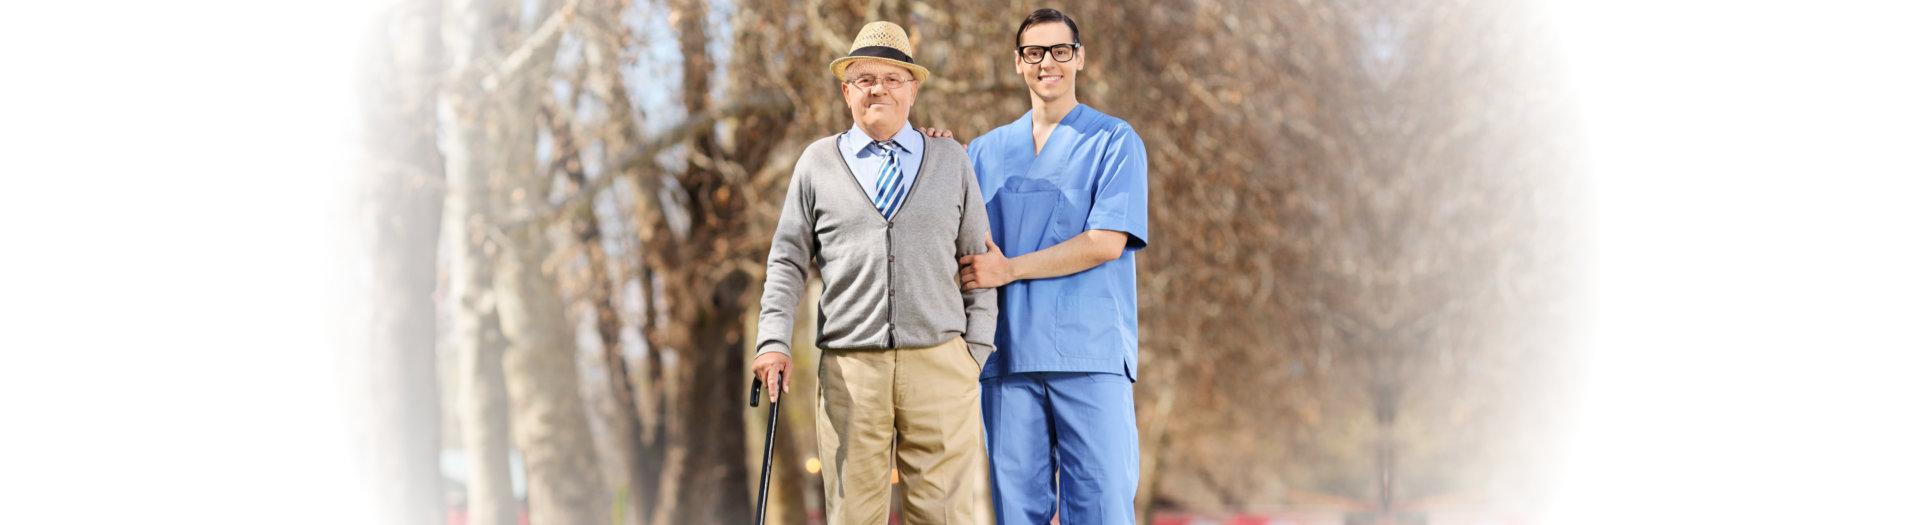 caregiver with senior man smiling